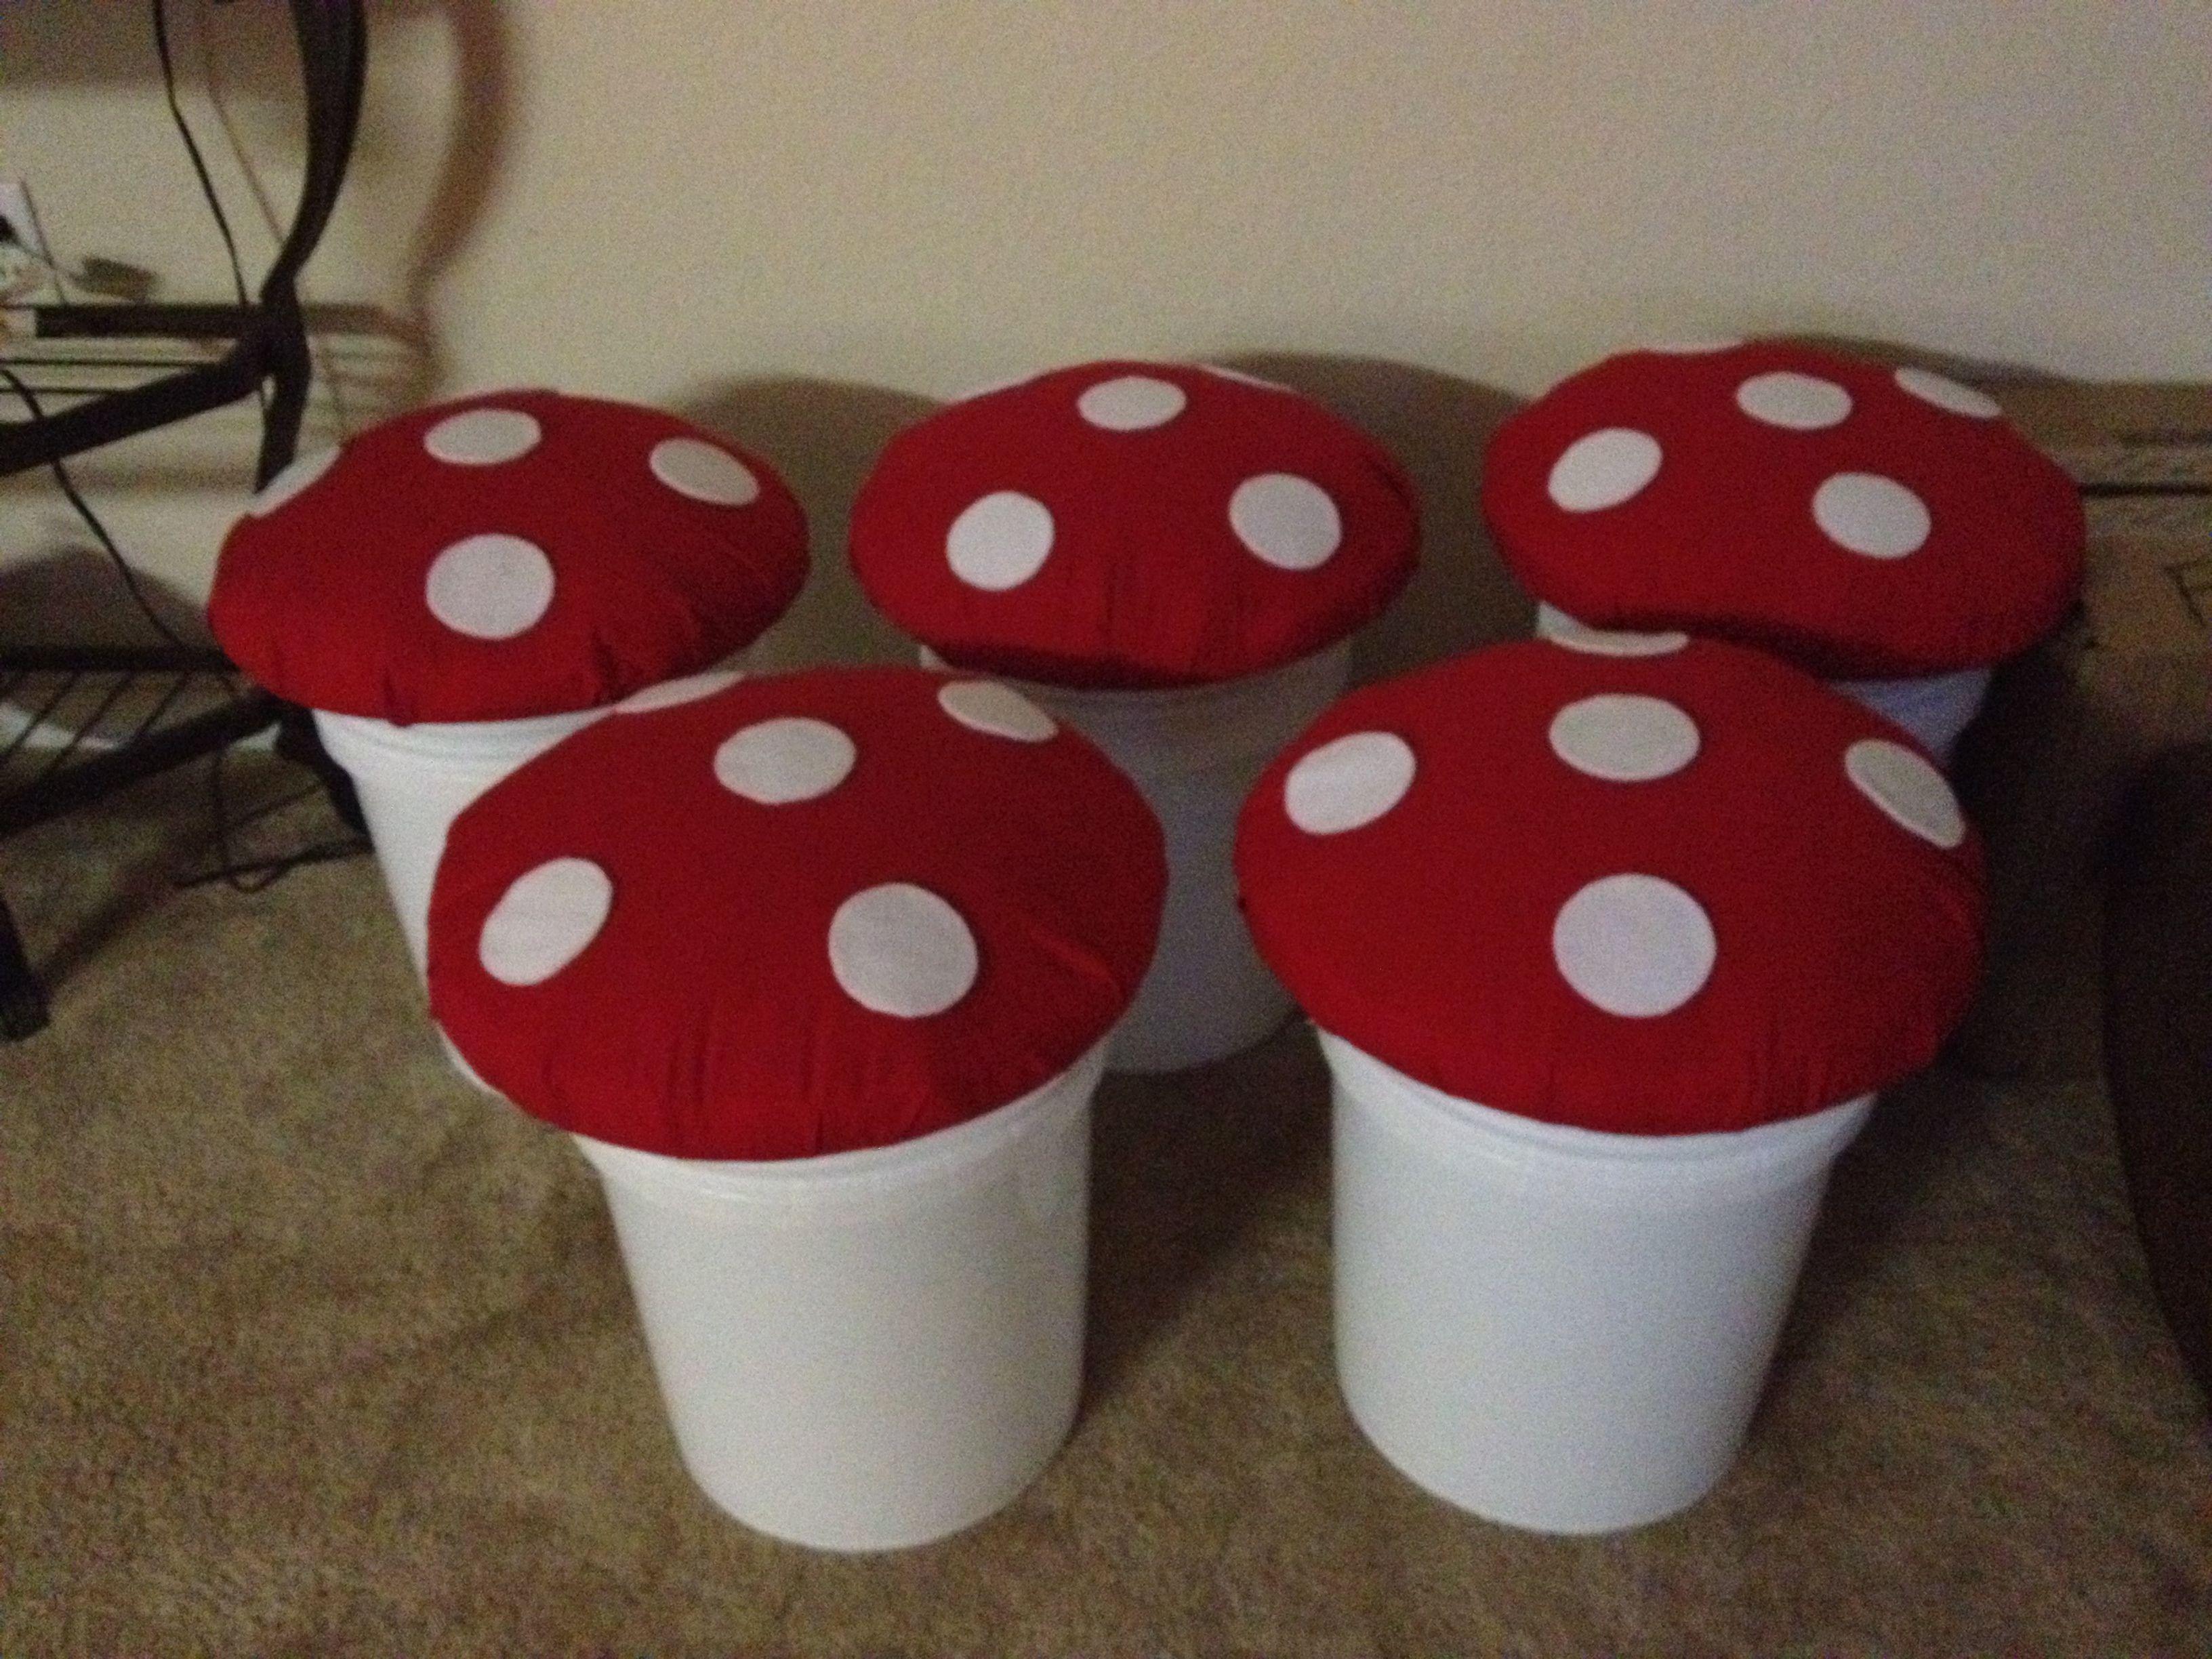 Diy mushroom chair - Mushroom Seats For A Smurf Themed Classroom